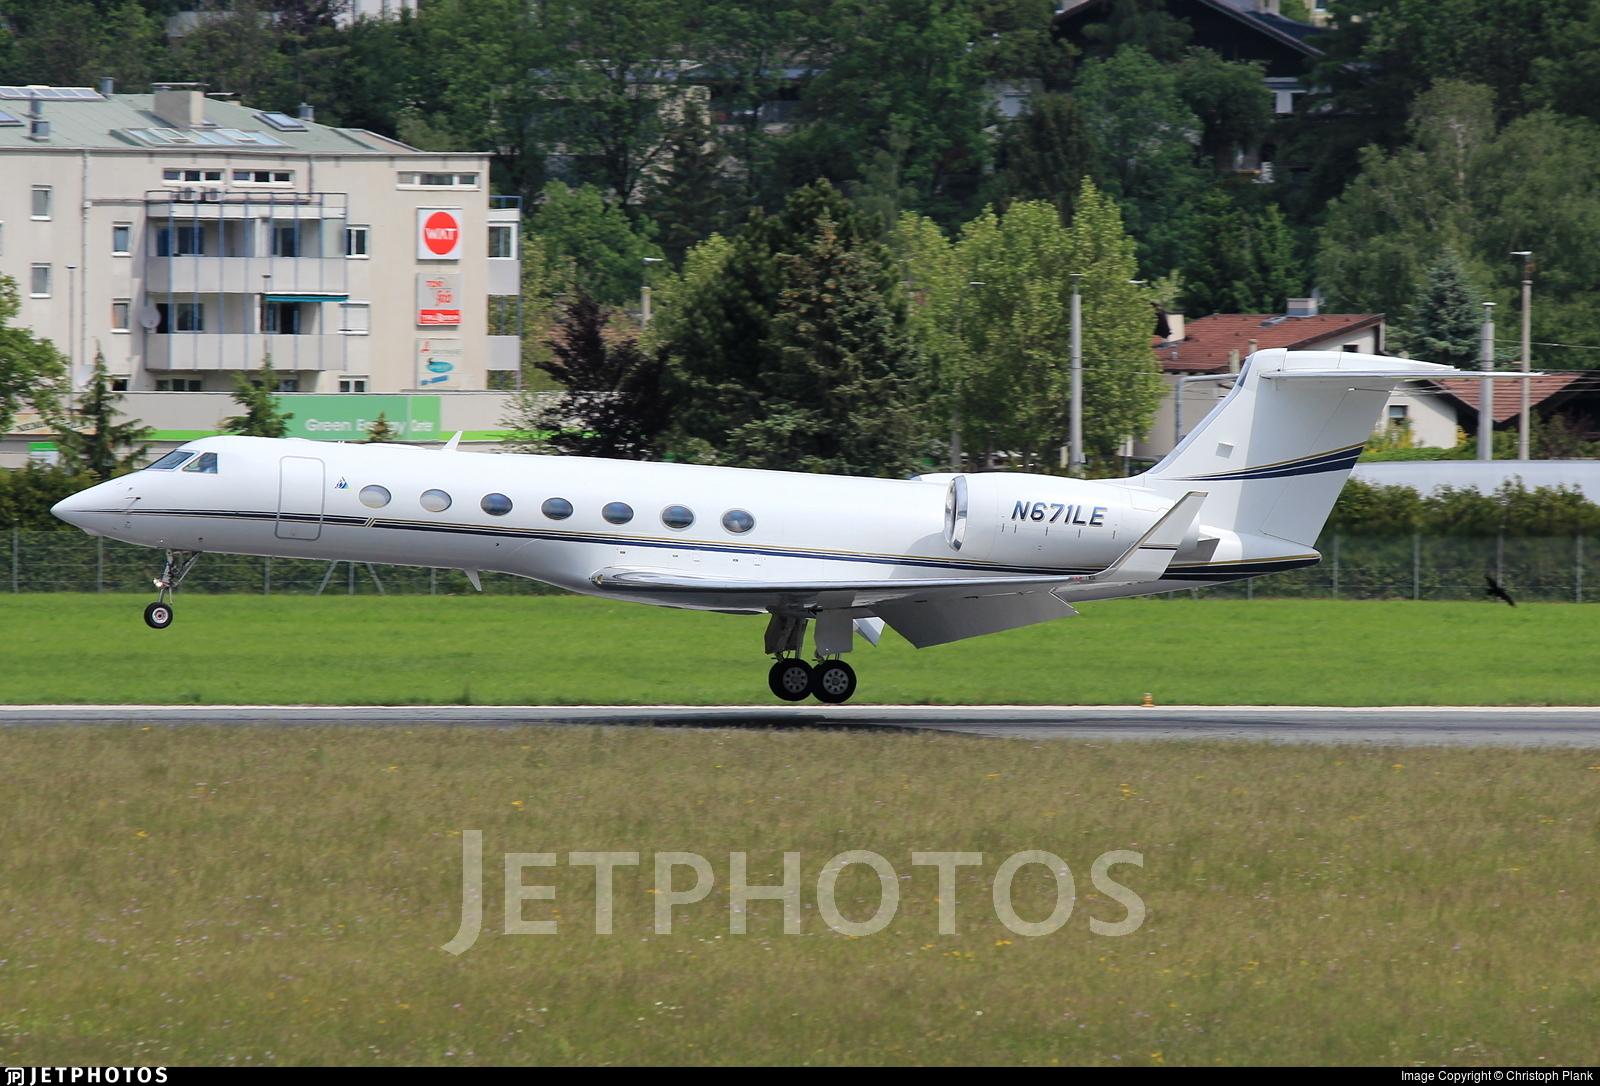 N671LE - Gulfstream G550 - AVN Air